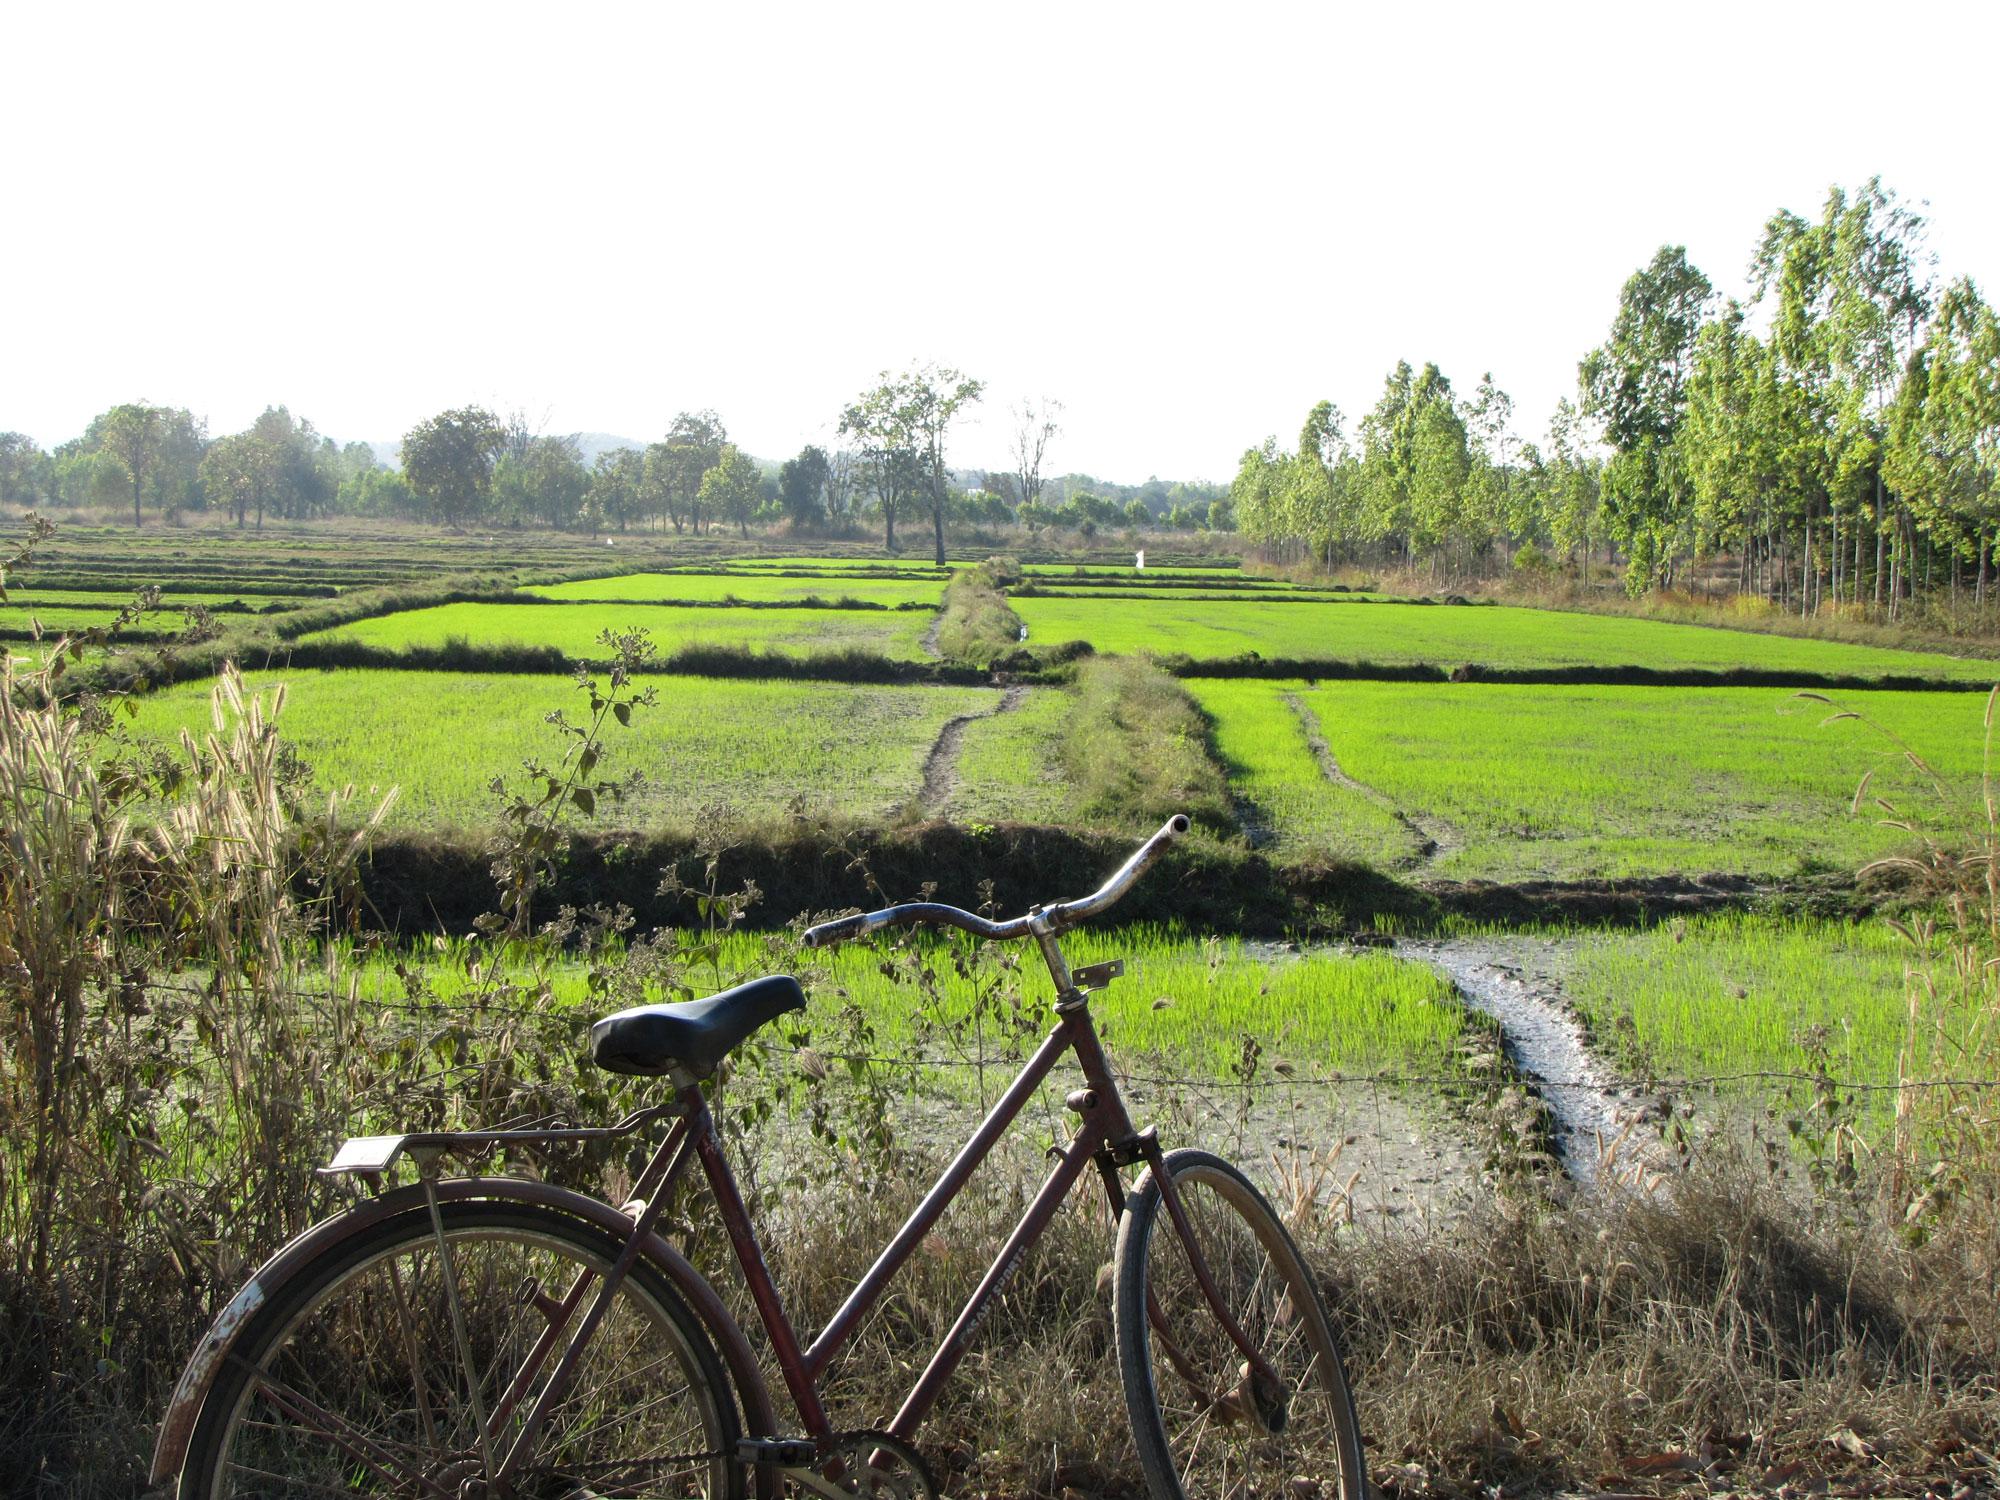 Nang Rong y sus alrededores